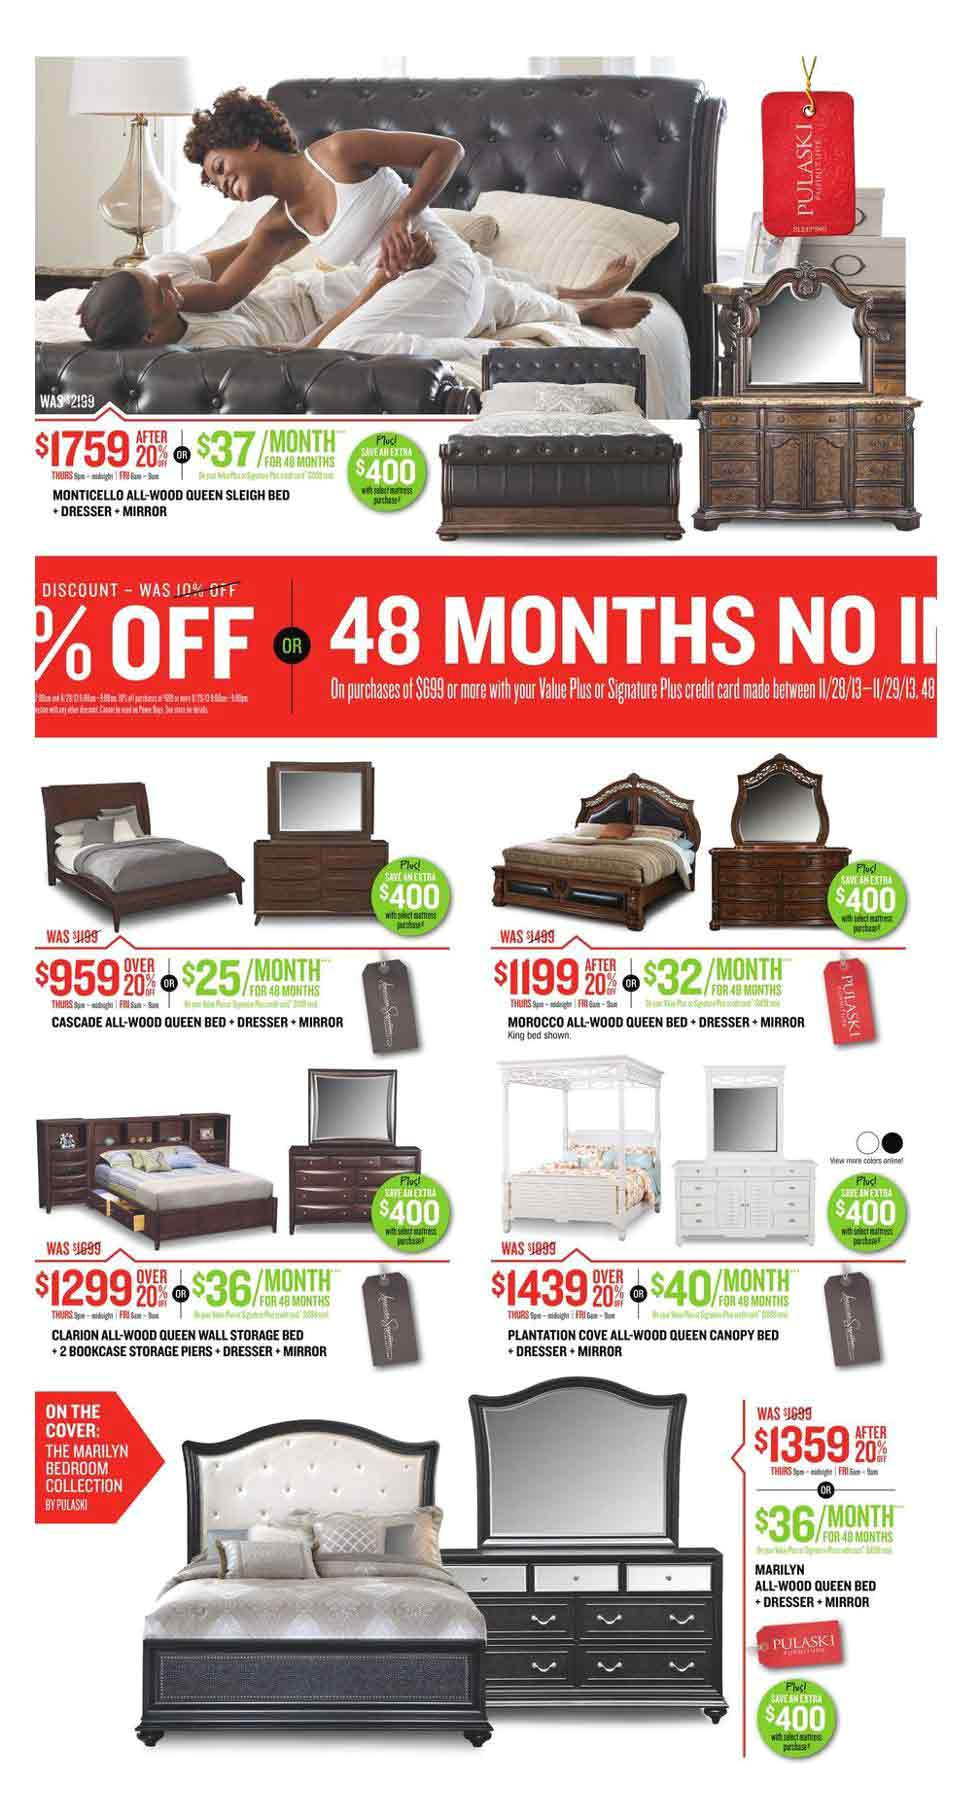 value city best black friday deals 2013